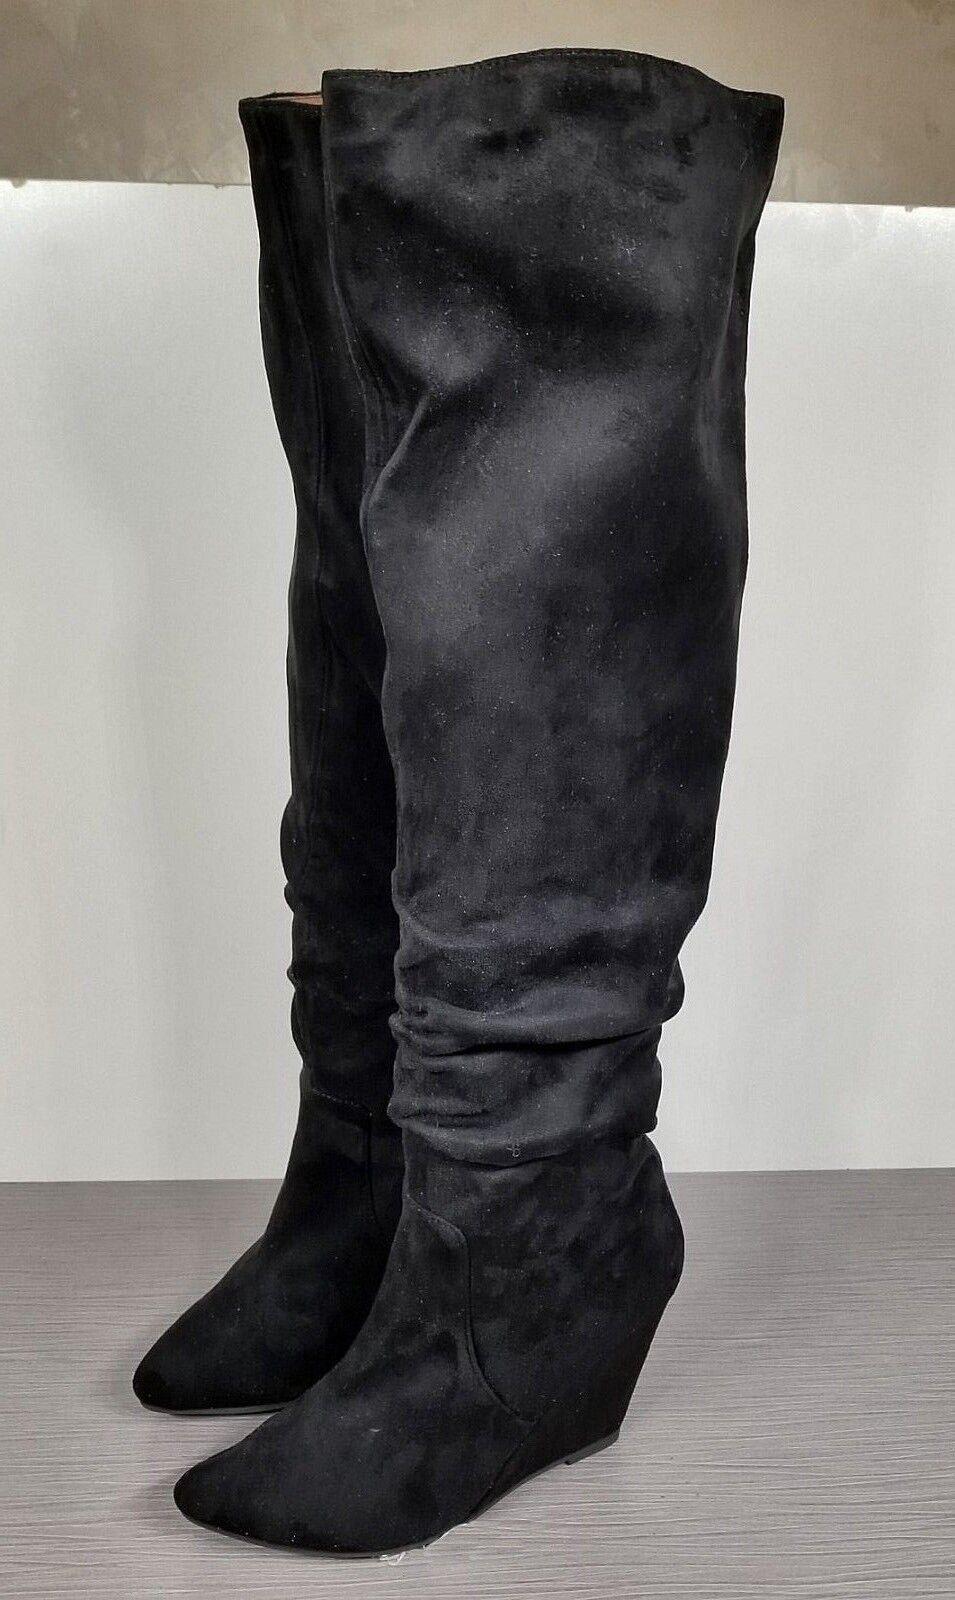 Jeffrey Campbell Revolucion Wedge OTK Boot, Black Faux Suede, Womens Size 8 M